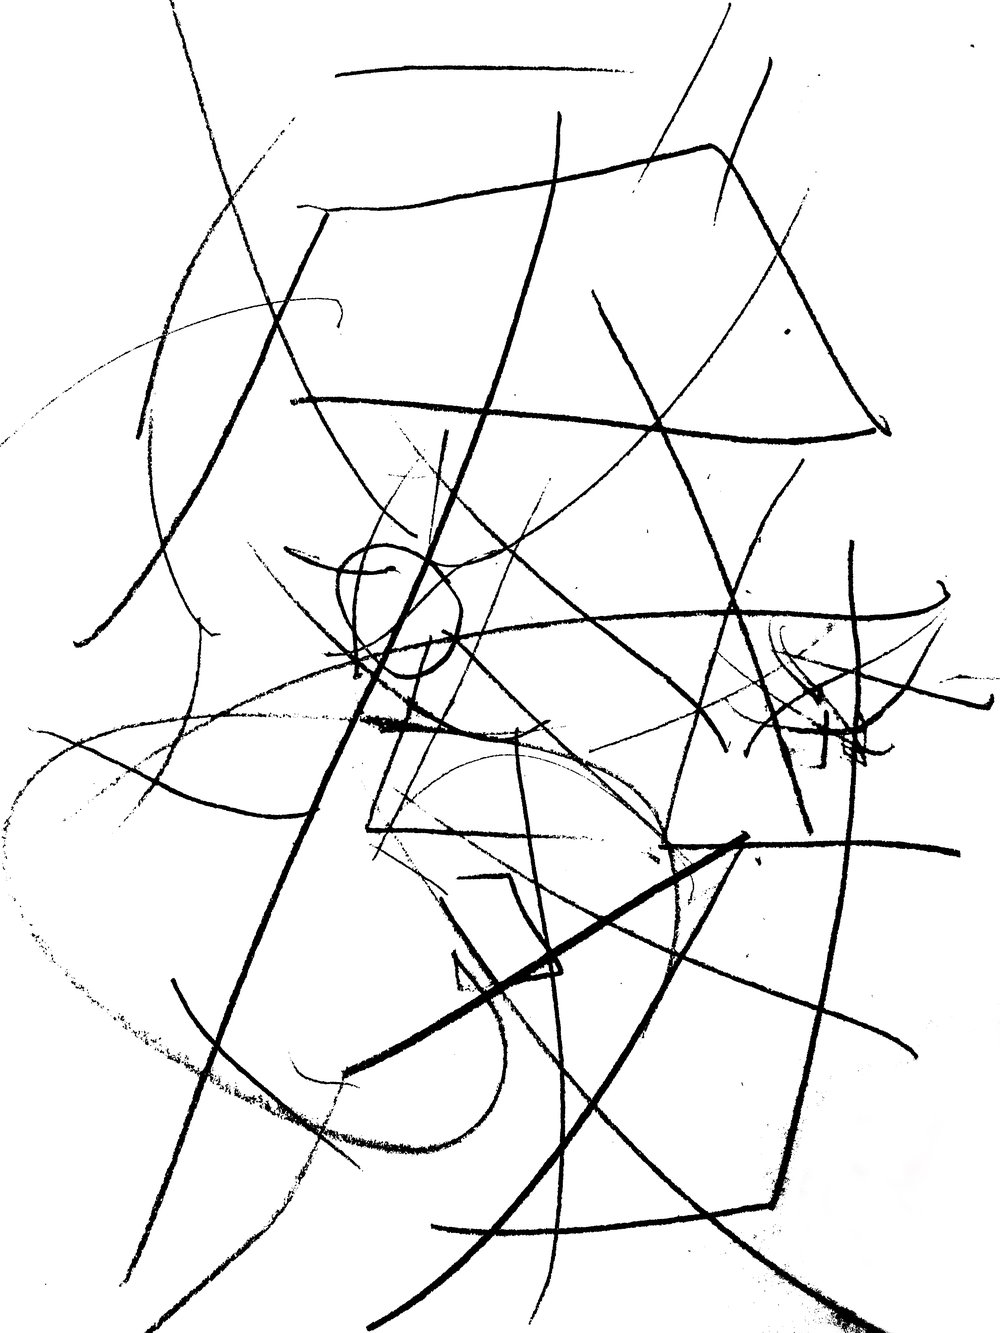 ODONATA Experimental creative group, translate thought into form